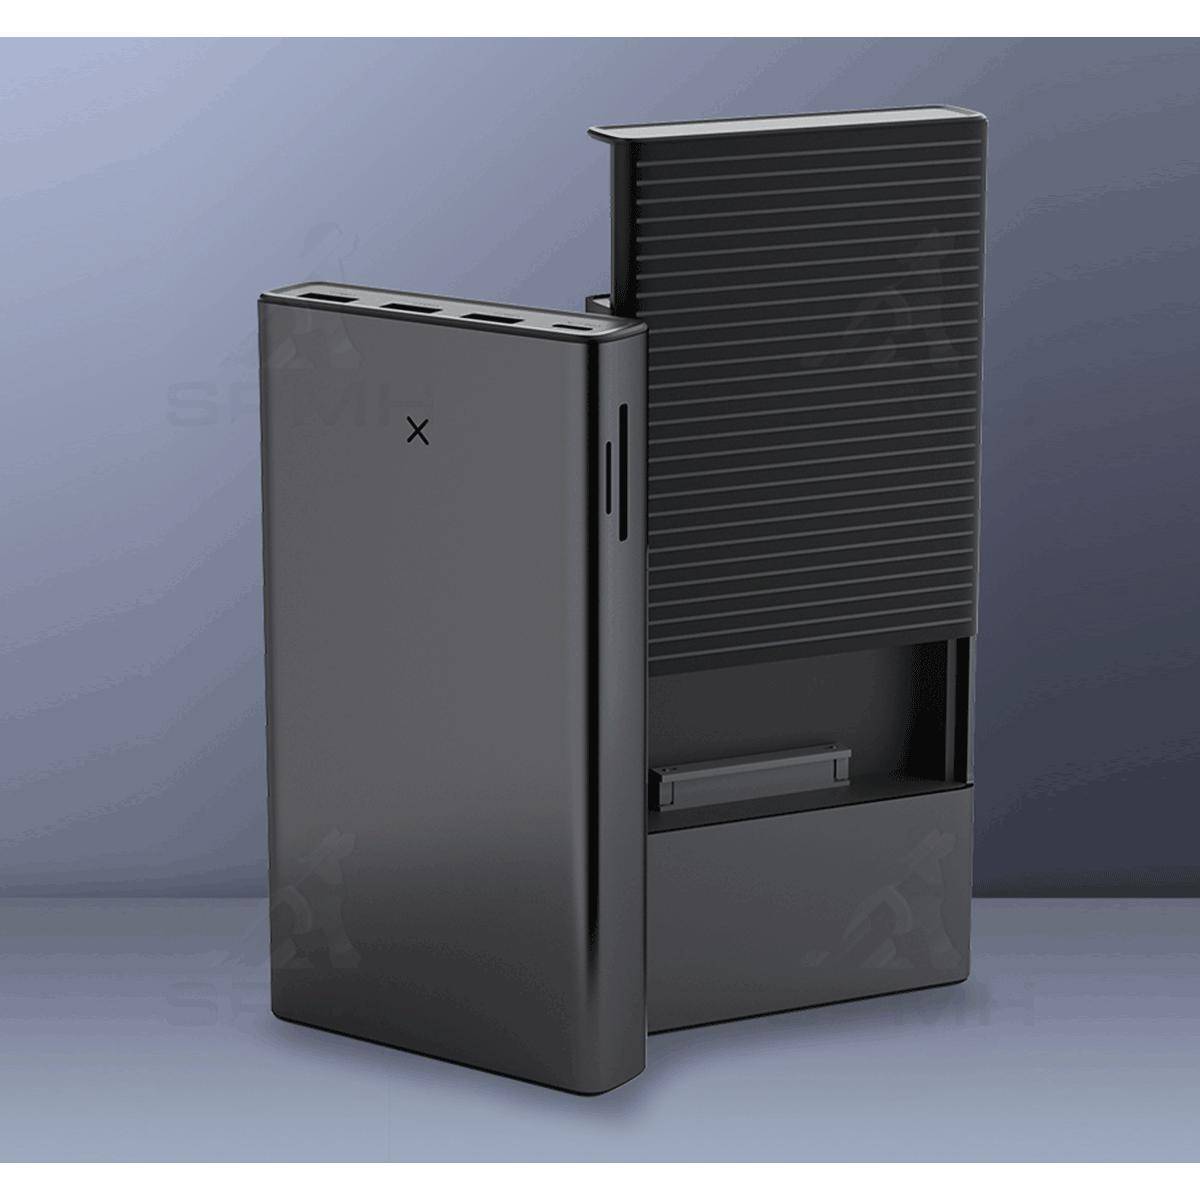 SPMH USB허브 외장하드 케이스 SD카드 리더 휴대용하드허브 독 도킹스테이션 (POP 5352700577)